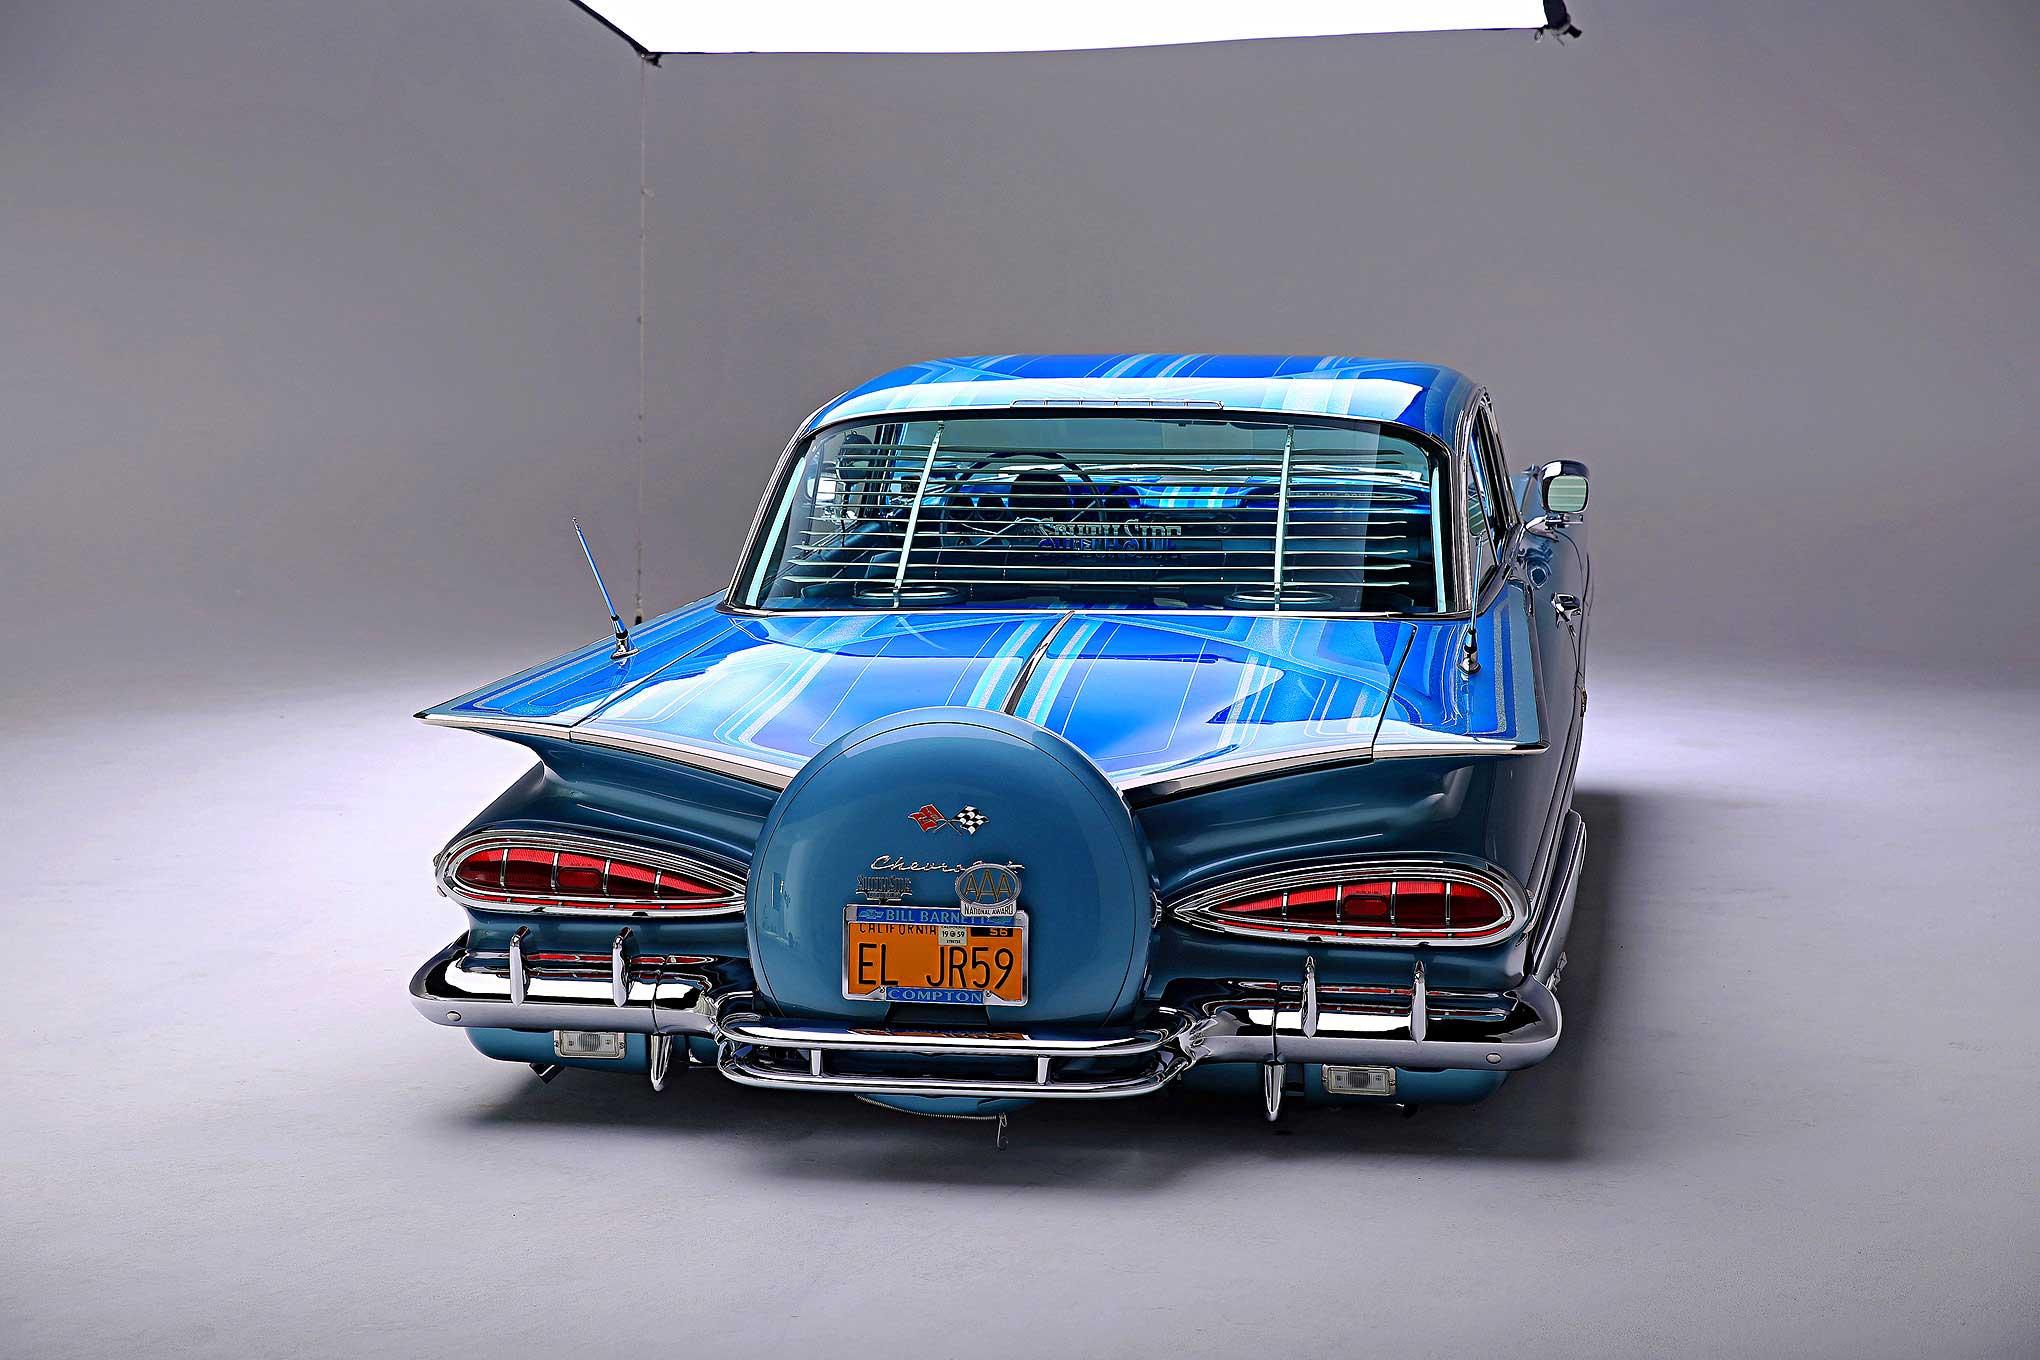 1959 Chevy Impala Rear Wiring Harness Schematics Diagrams 1957 Bel Air Convertible Lowrider Chevrolet Built In Tijuana Rh Com 1965